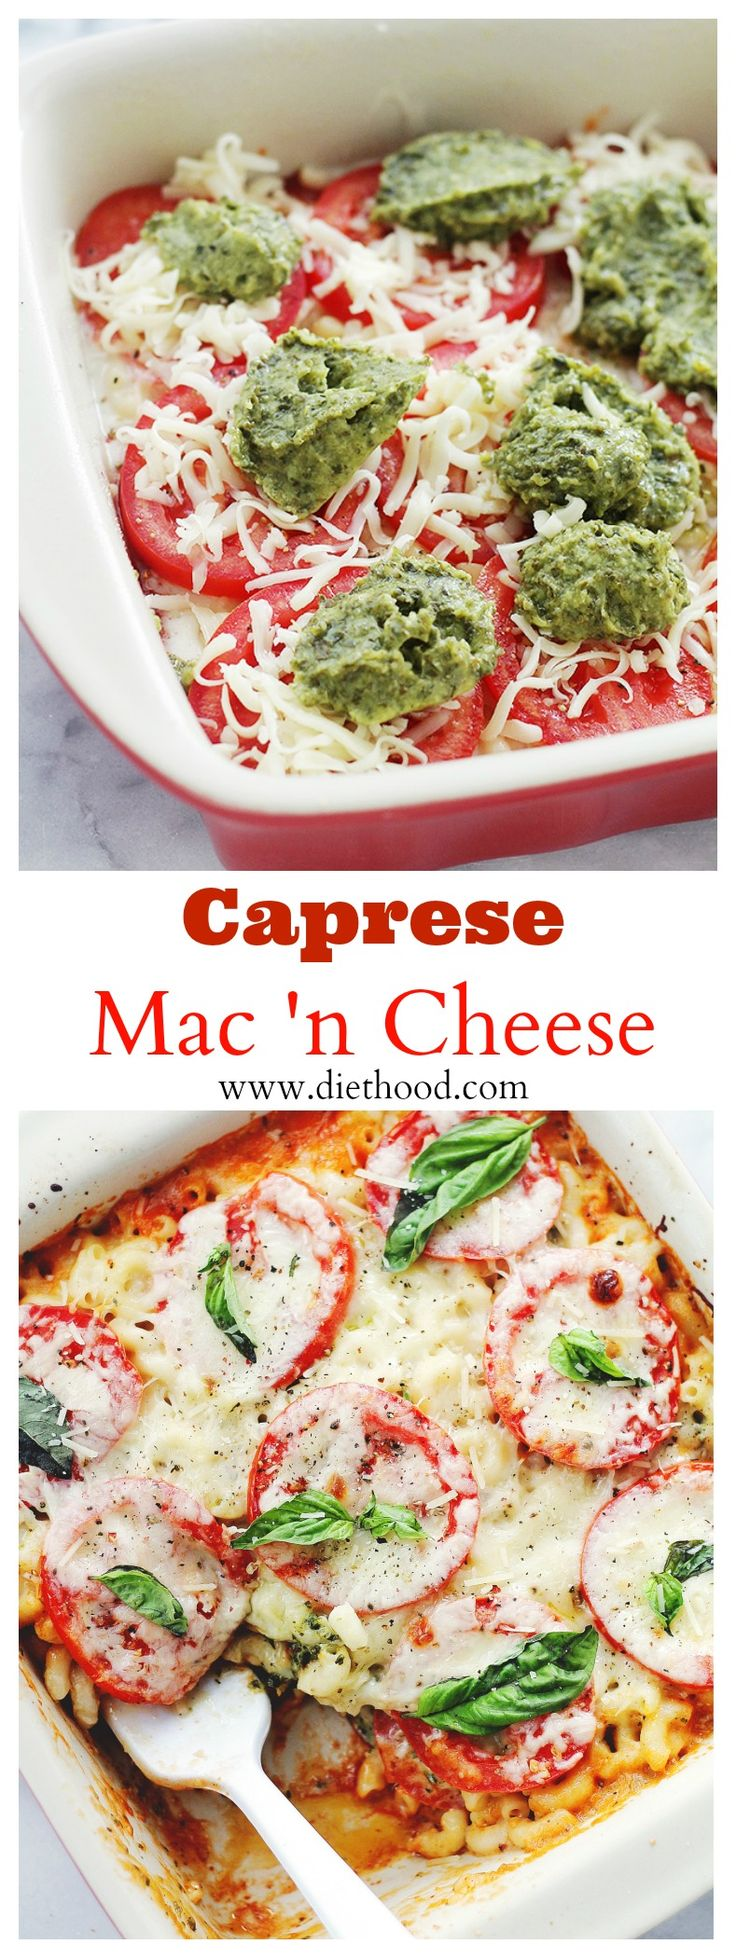 Caprese Macaroni and Cheese | www.diethood.com | Creamy and delicious Macaroni and Cheese made with a mozzarella cheese-sauce, basil pesto, and fresh tomatoes. | #pasta #macaroniandcheese